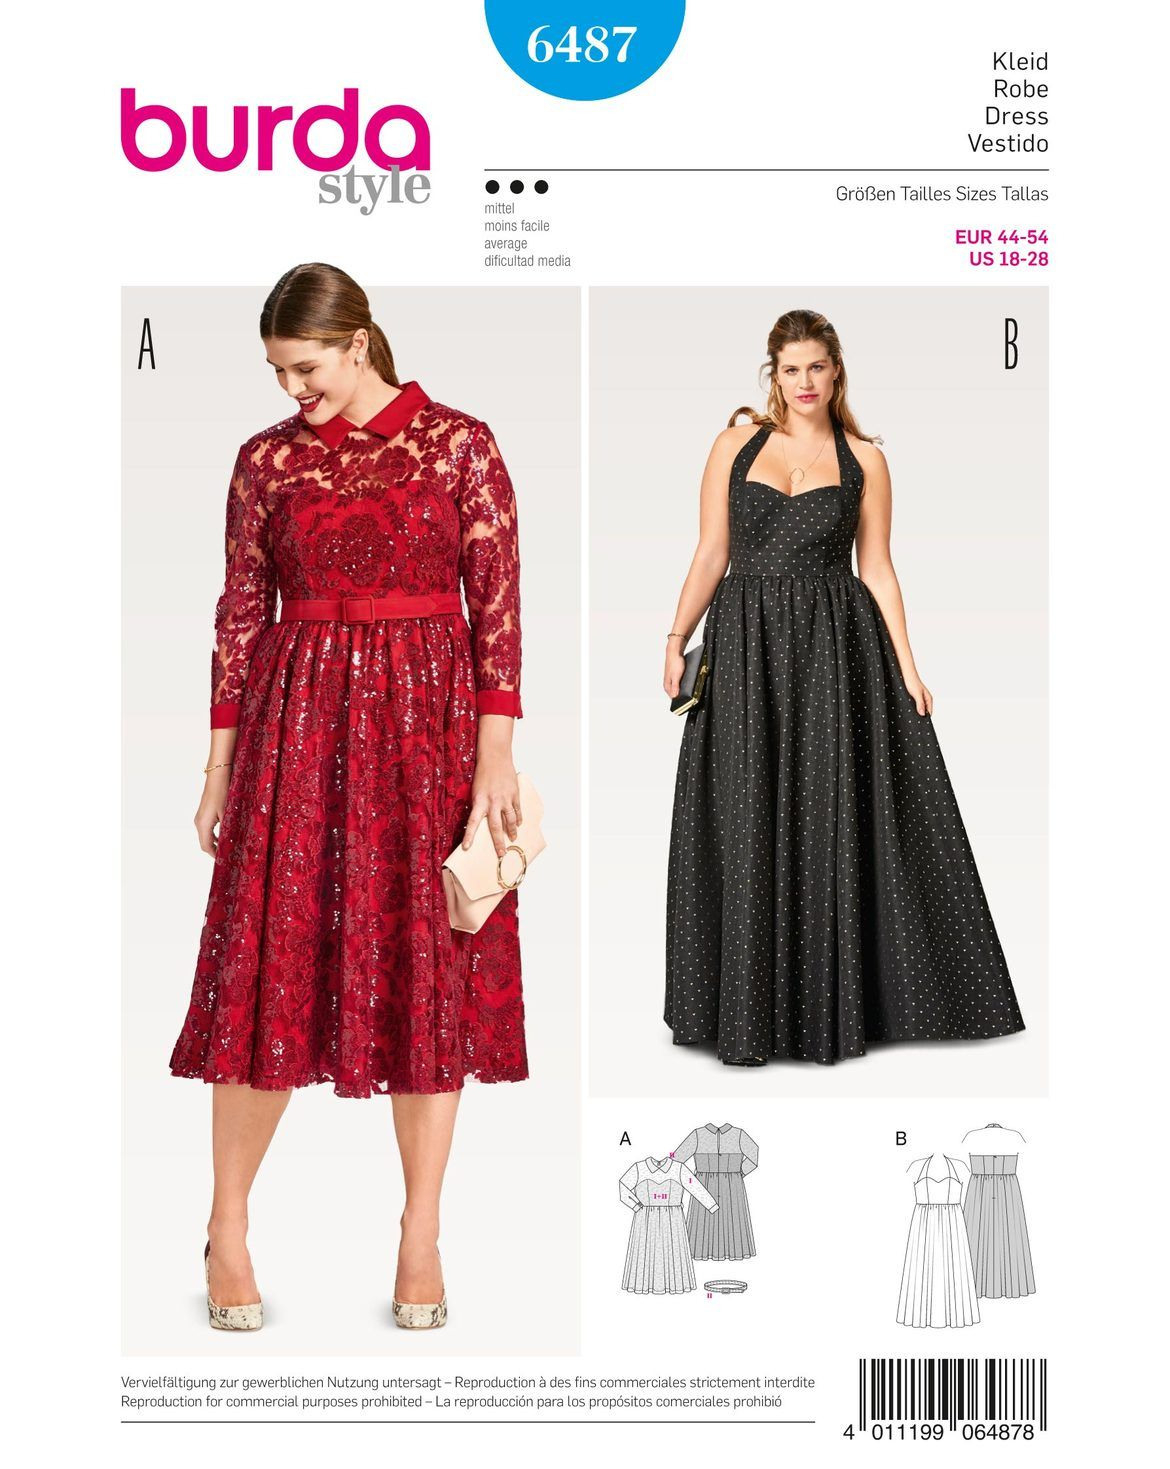 Designer Genial Burda Abendkleid Galerie20 Fantastisch Burda Abendkleid Vertrieb